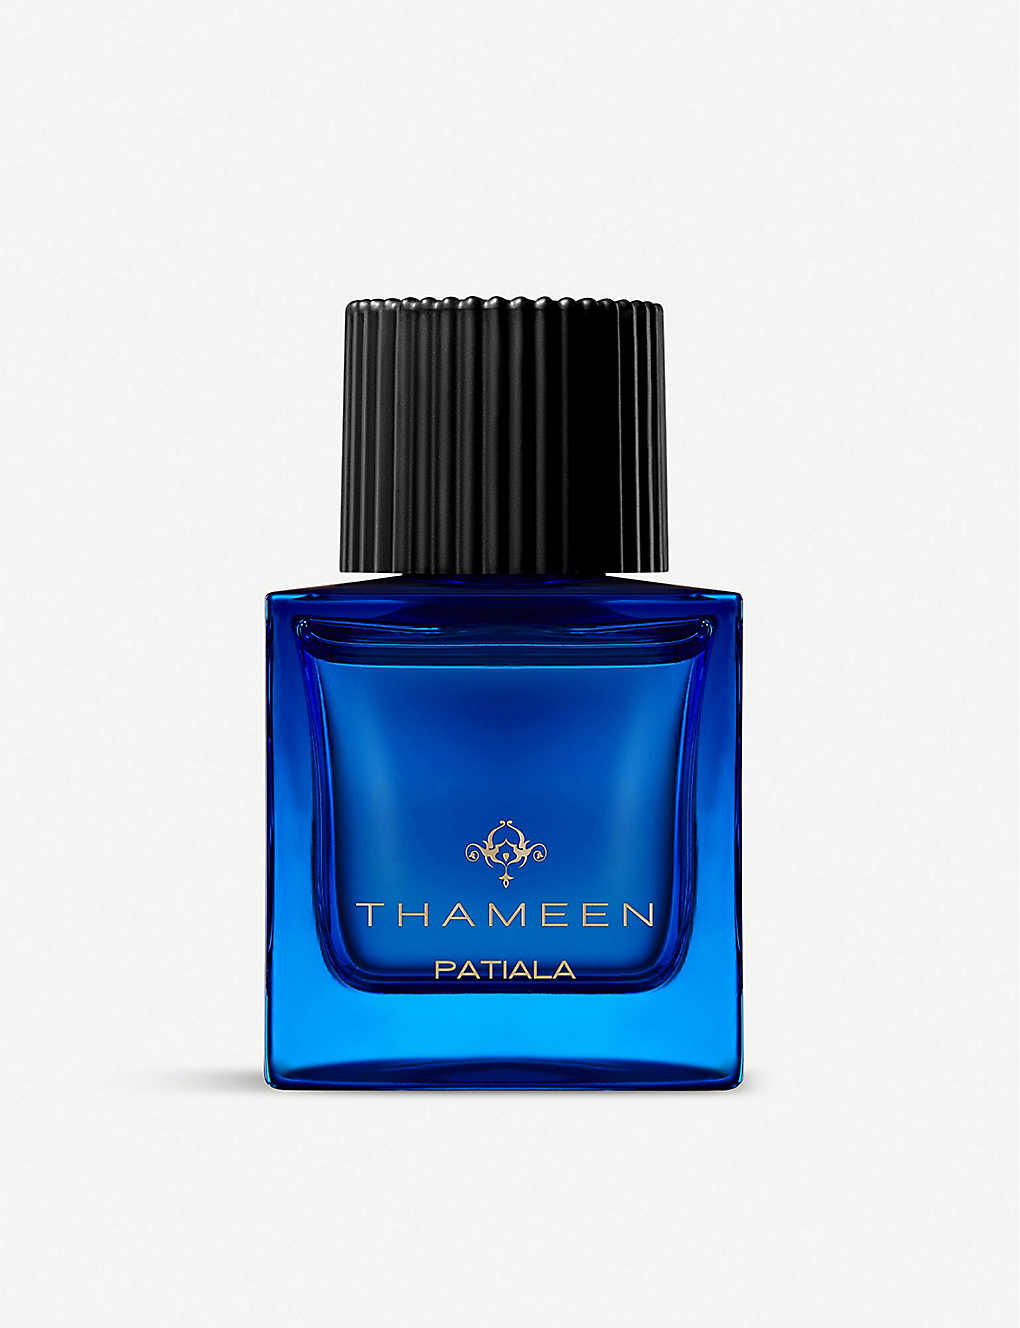 Thameen Patiala Eau De Parfum Selfridgescom